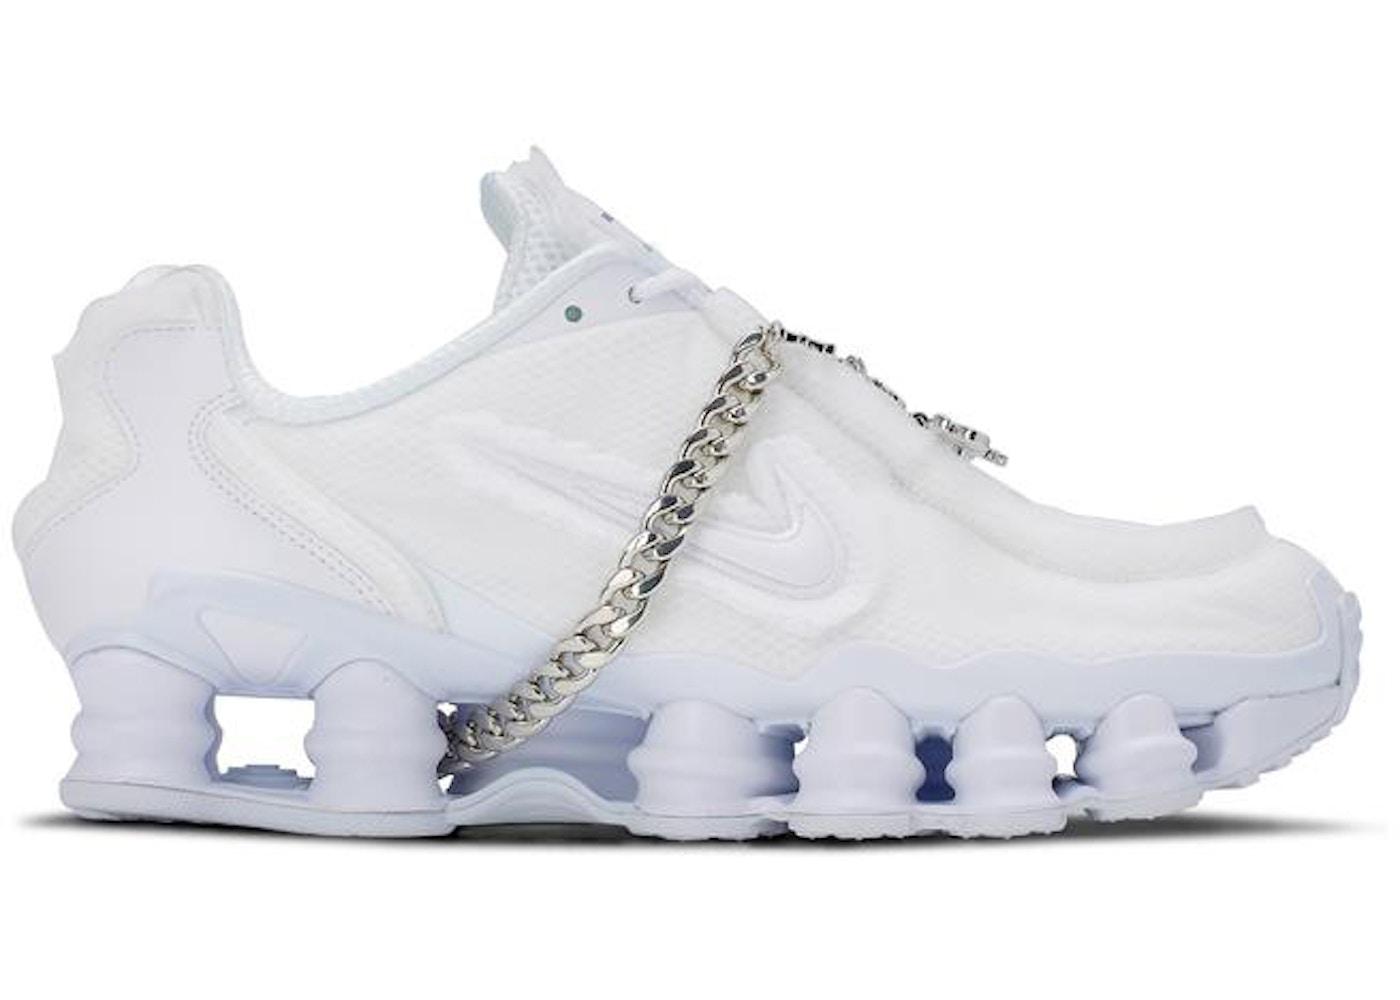 equilibrio Intenso Menda City  Nike Shox TL Comme des Garcons White (W) - CJ0546 100